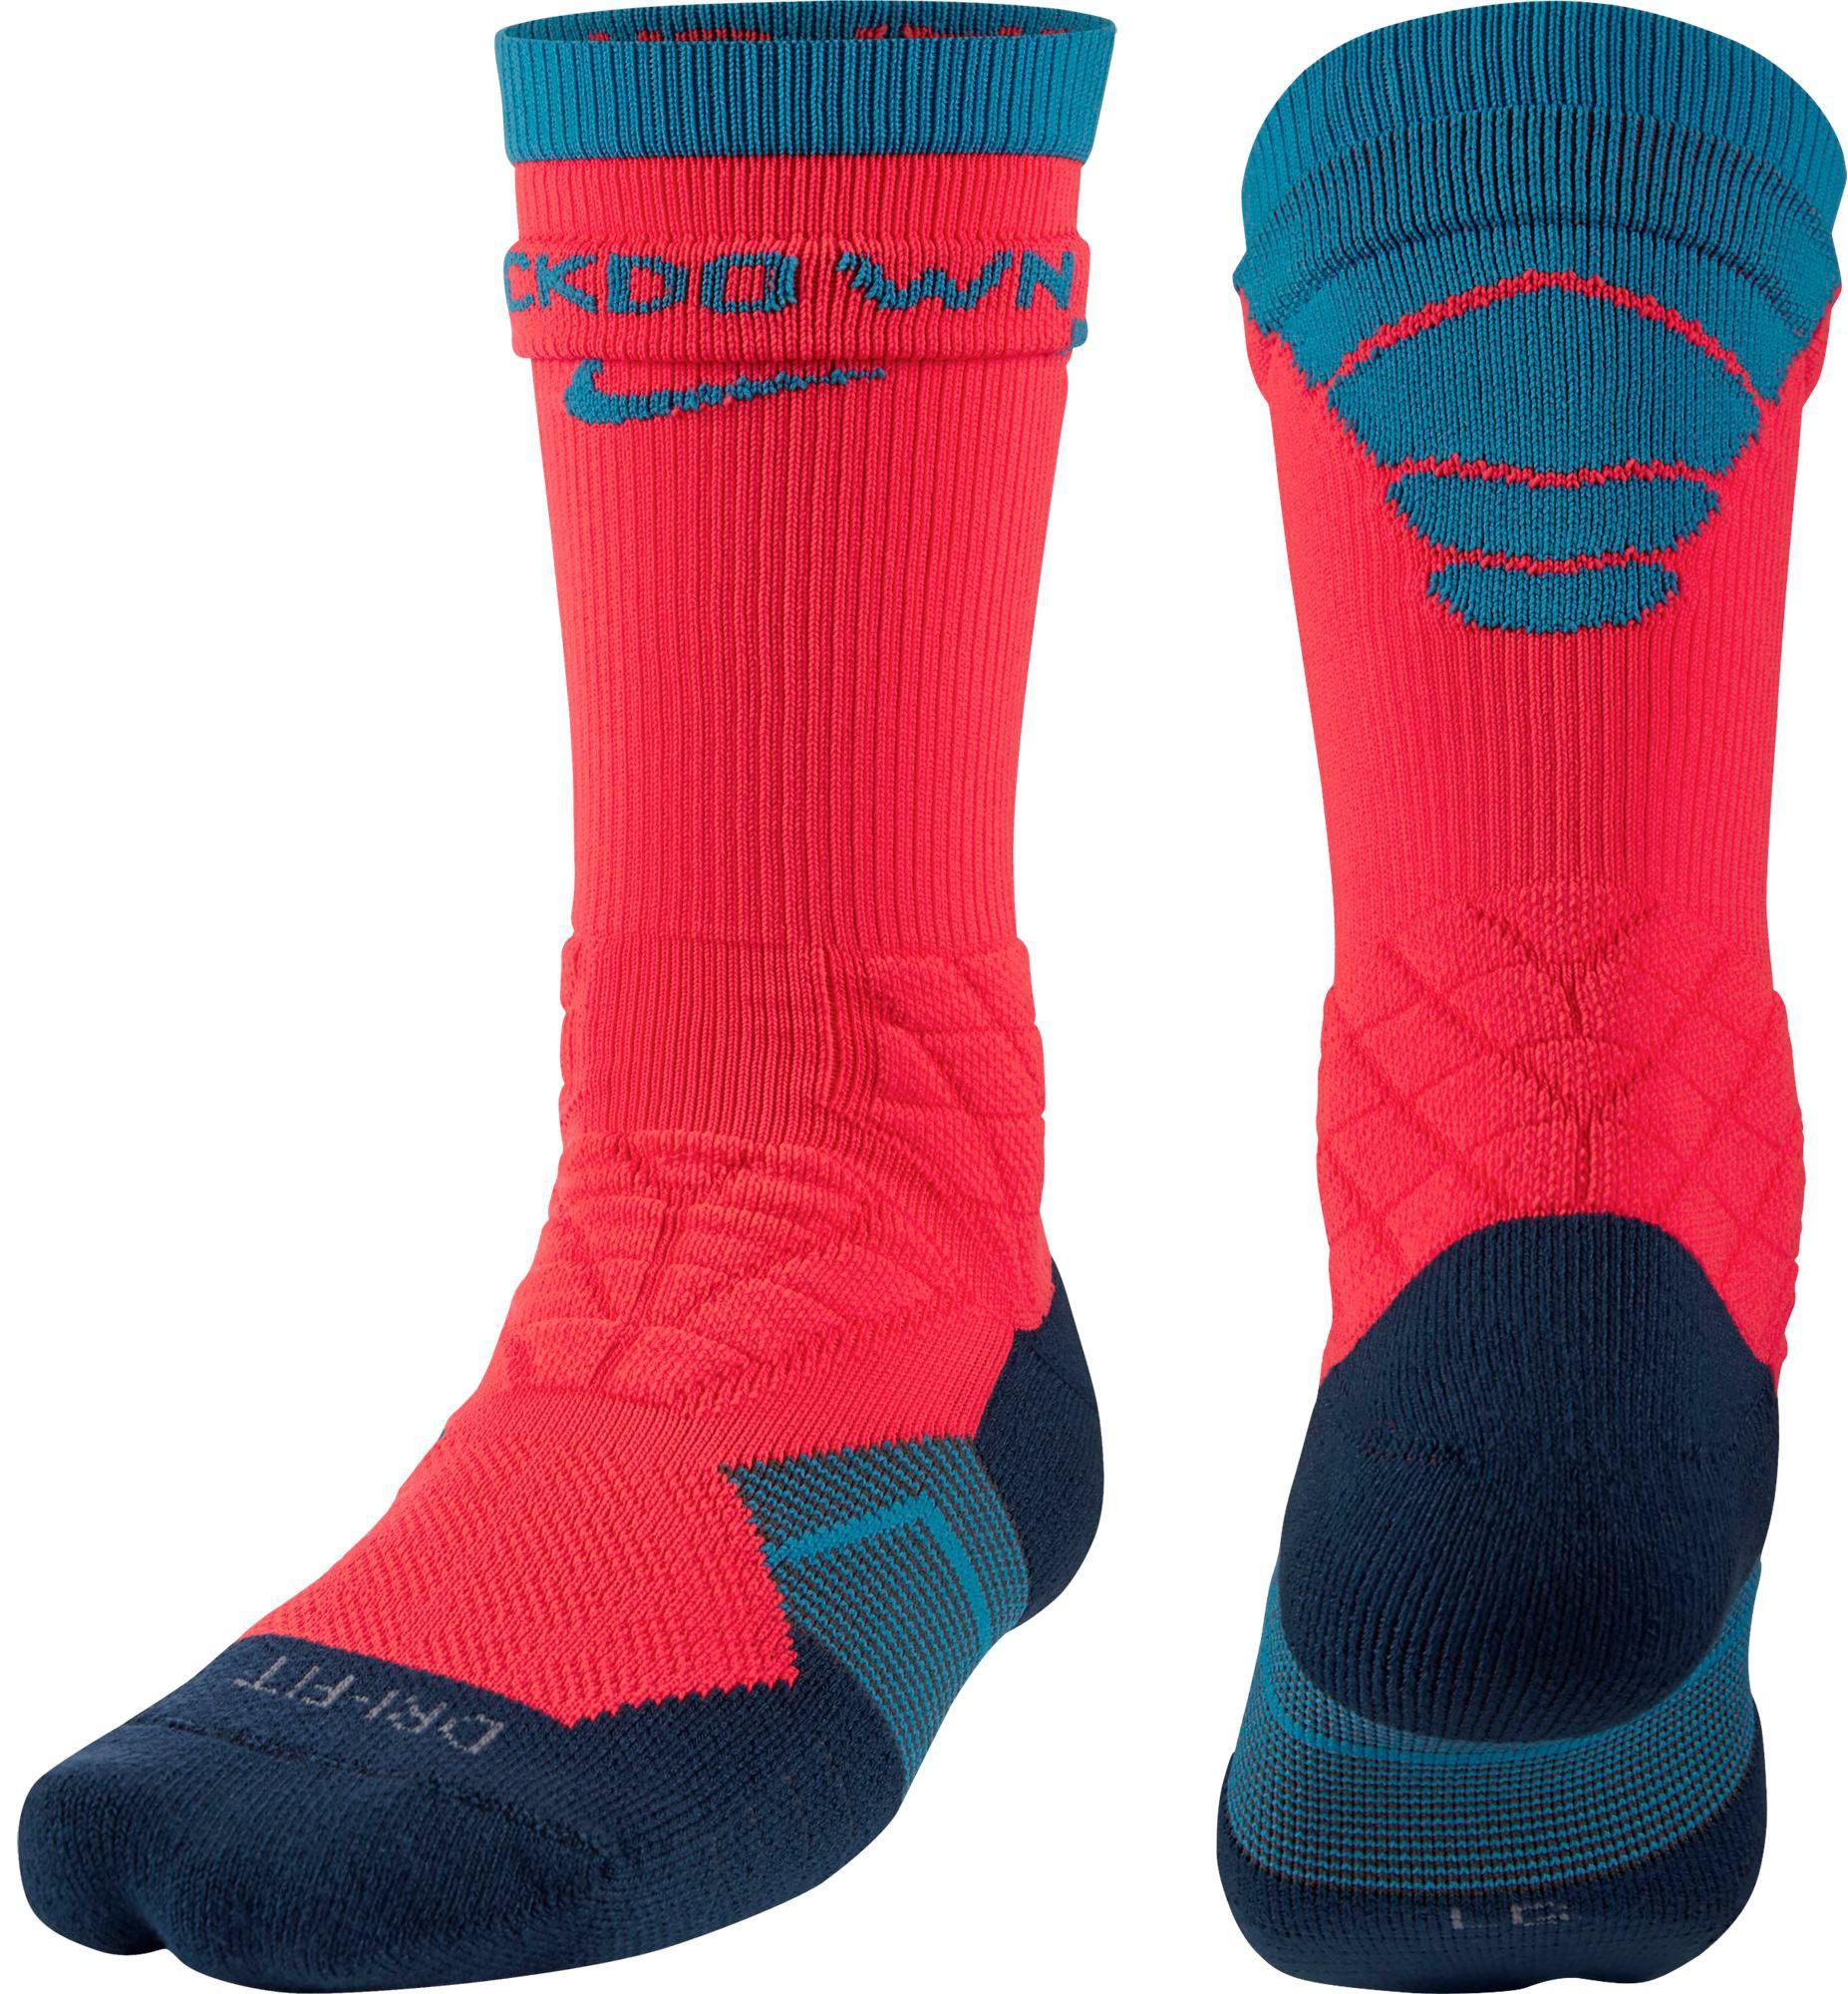 414c3ebbf0280 Elite Vapor Football Socks - Image Sock and Collections ...